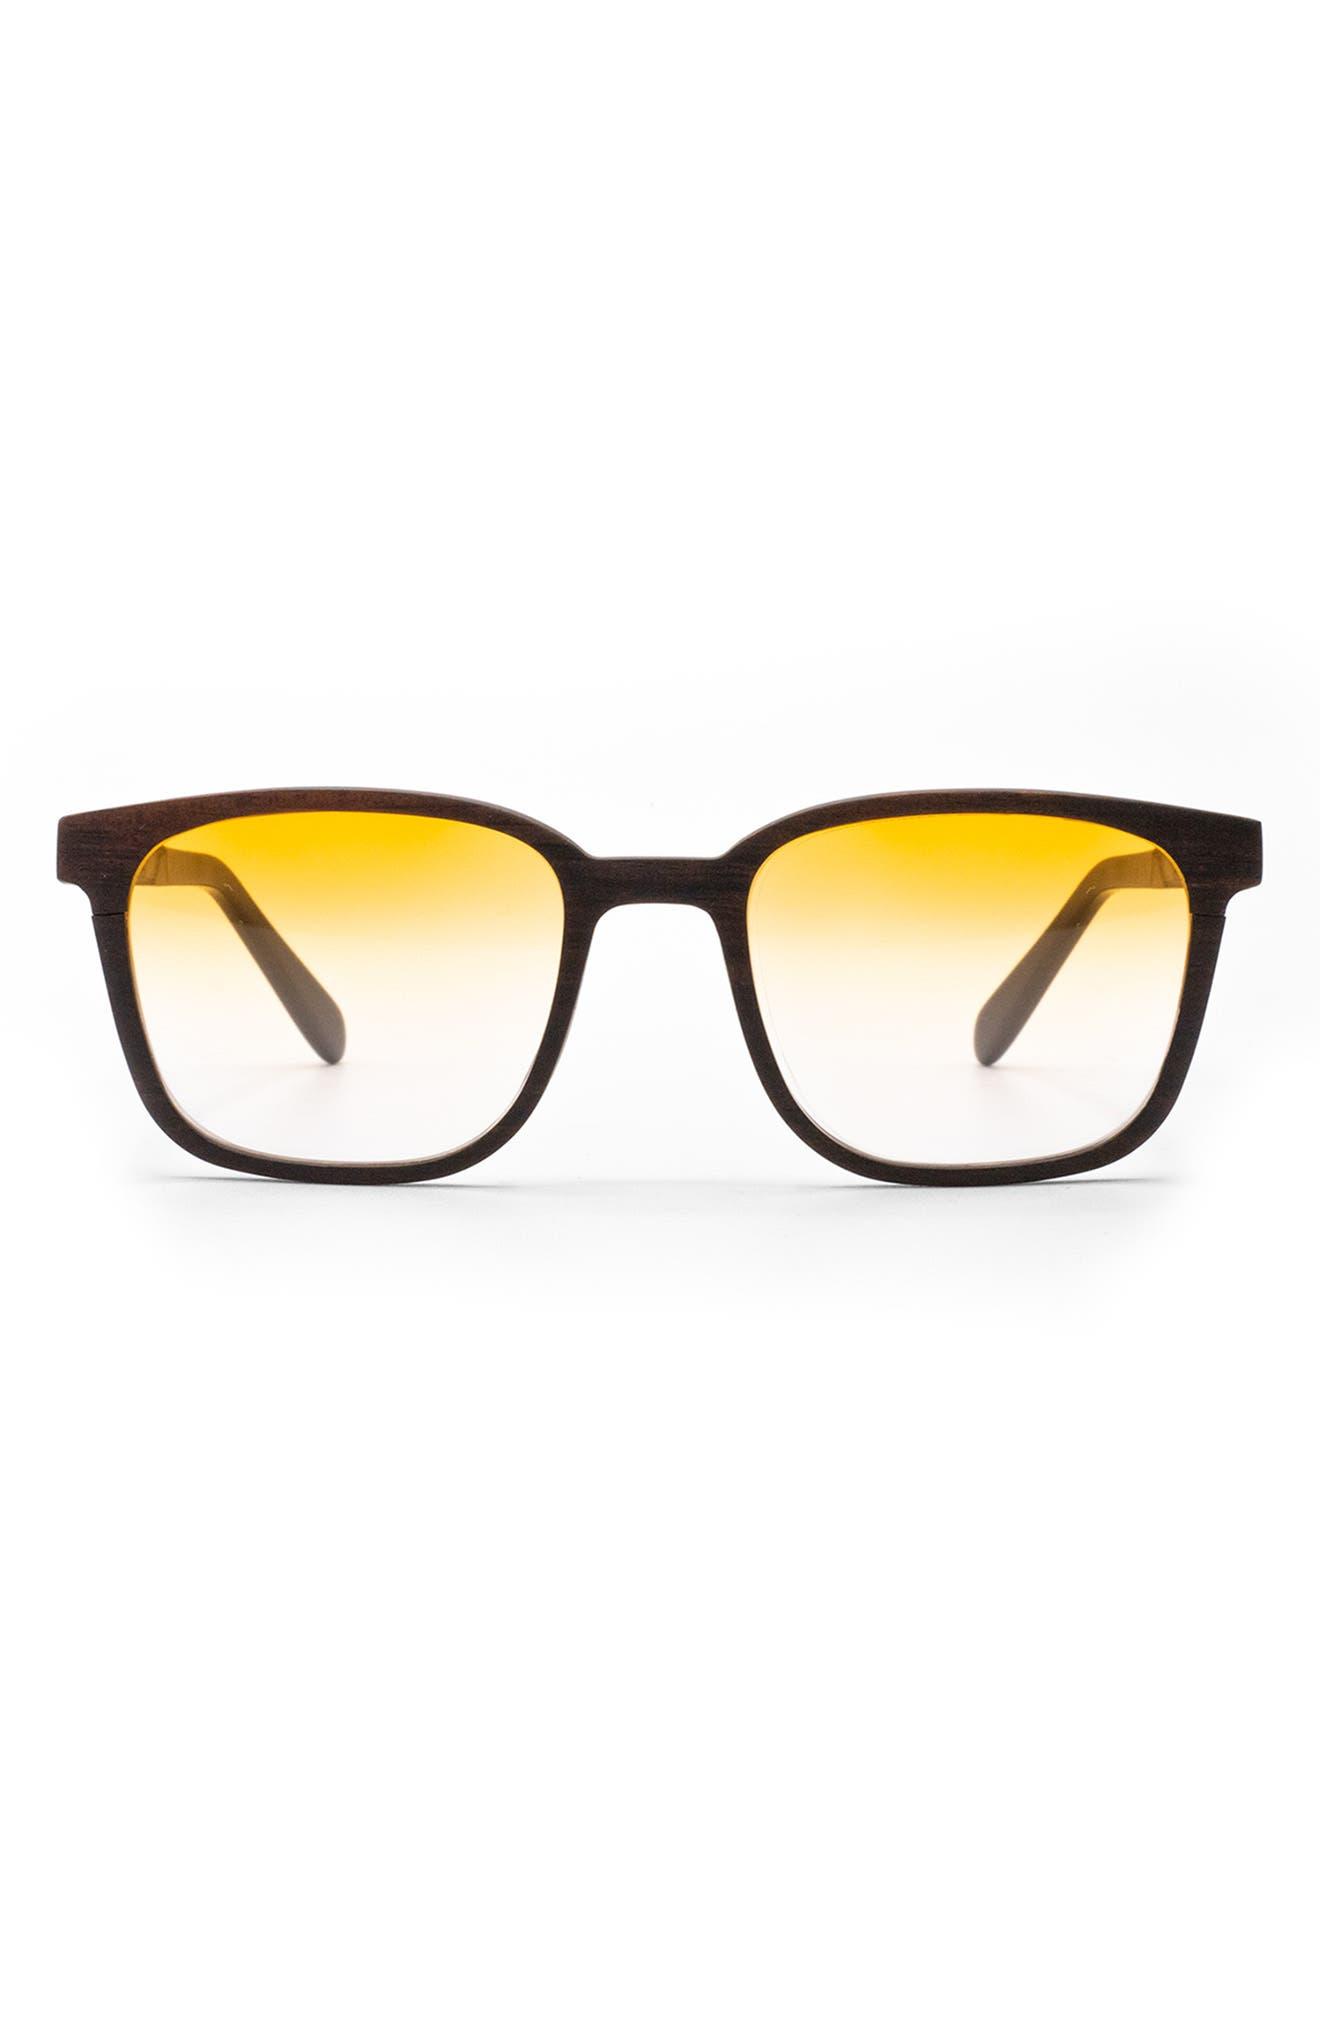 Jetter 50mm Gradient Square Sunglasses